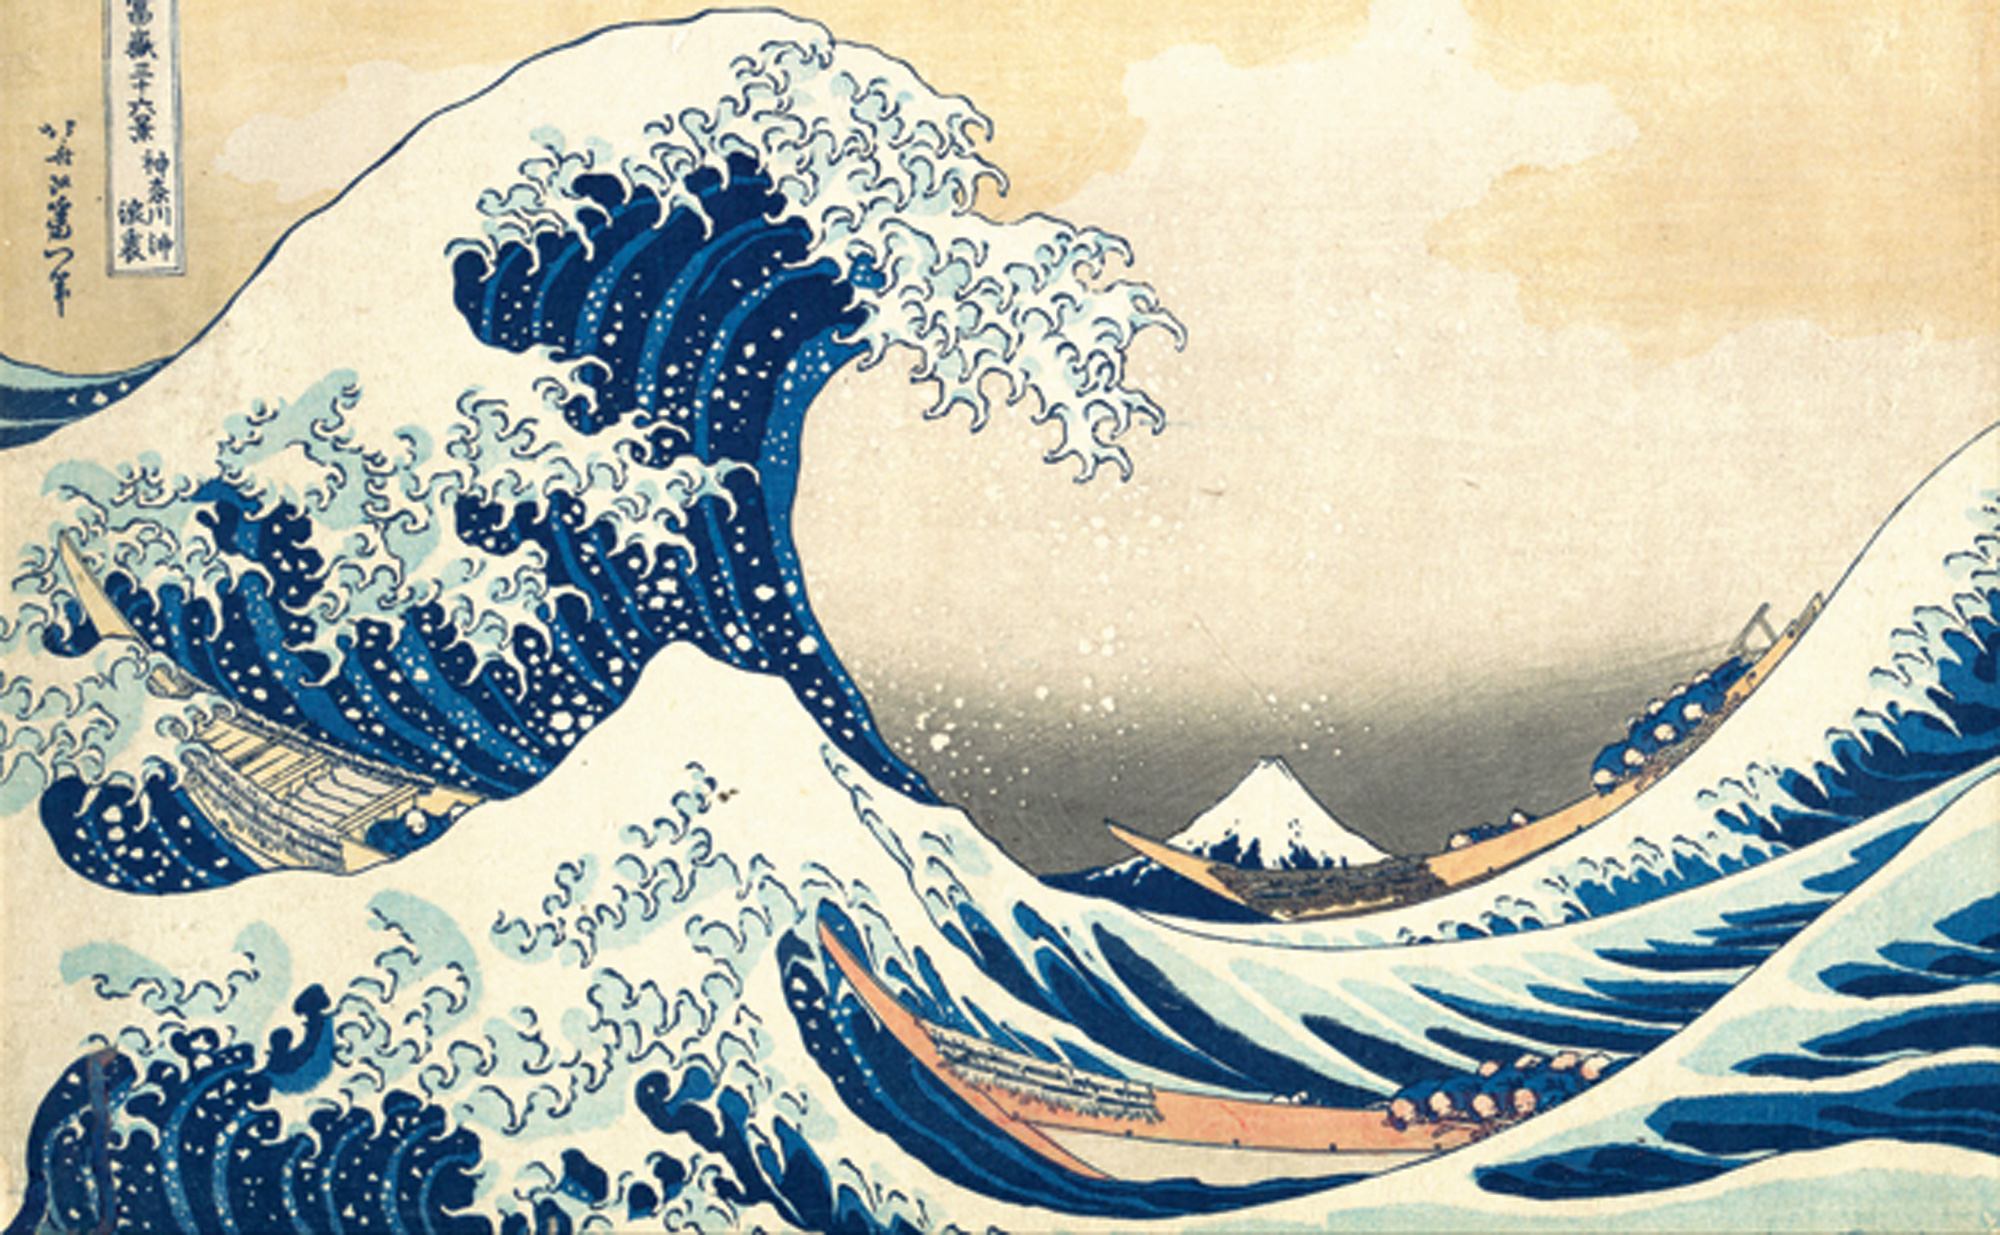 The Great Wave off Kanagawa, Print by Hokusai